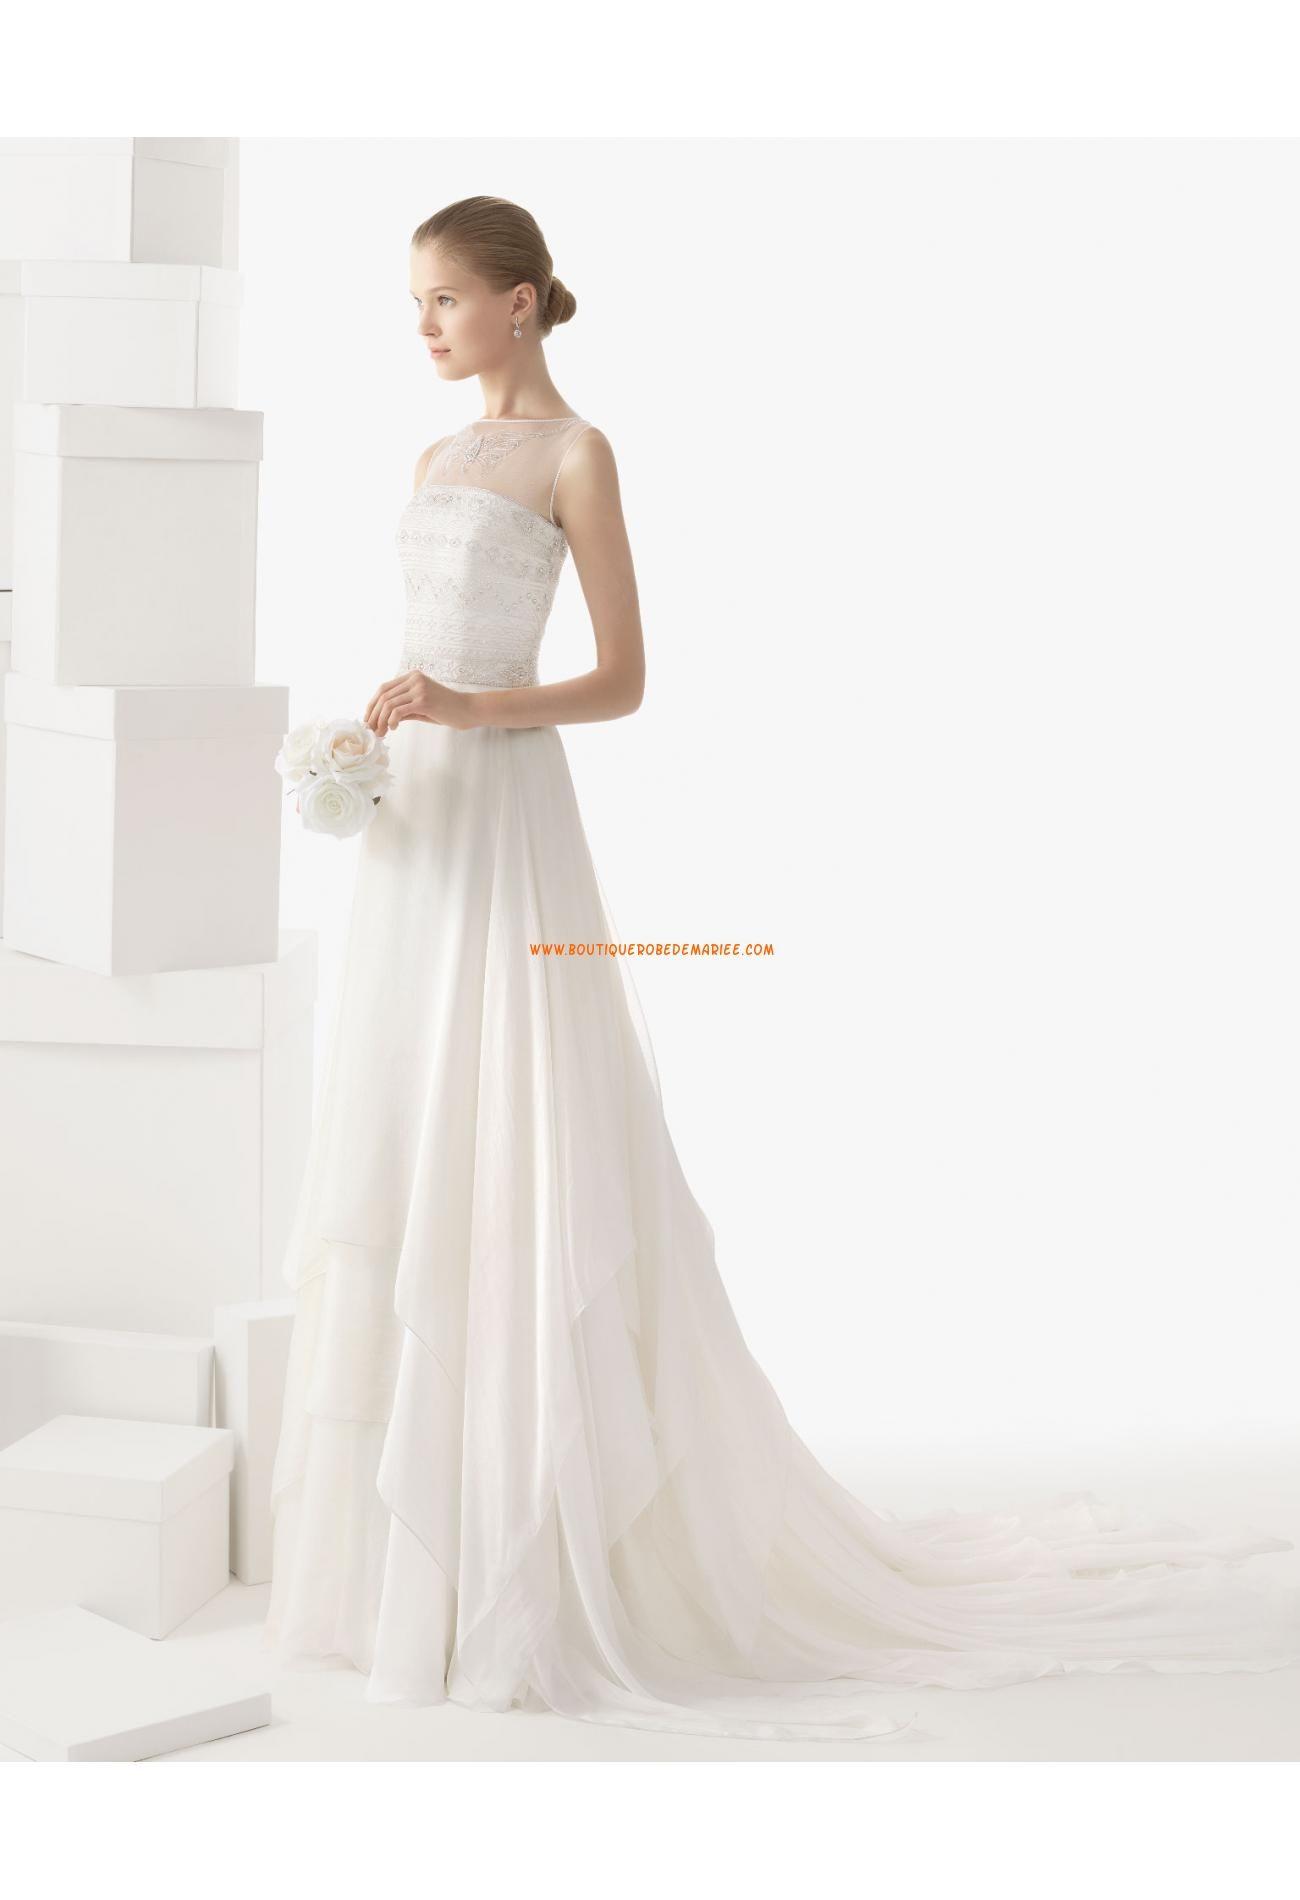 One of a kind wedding dresses  Robe de marie mousseline bustier perles cristal  wedding needed